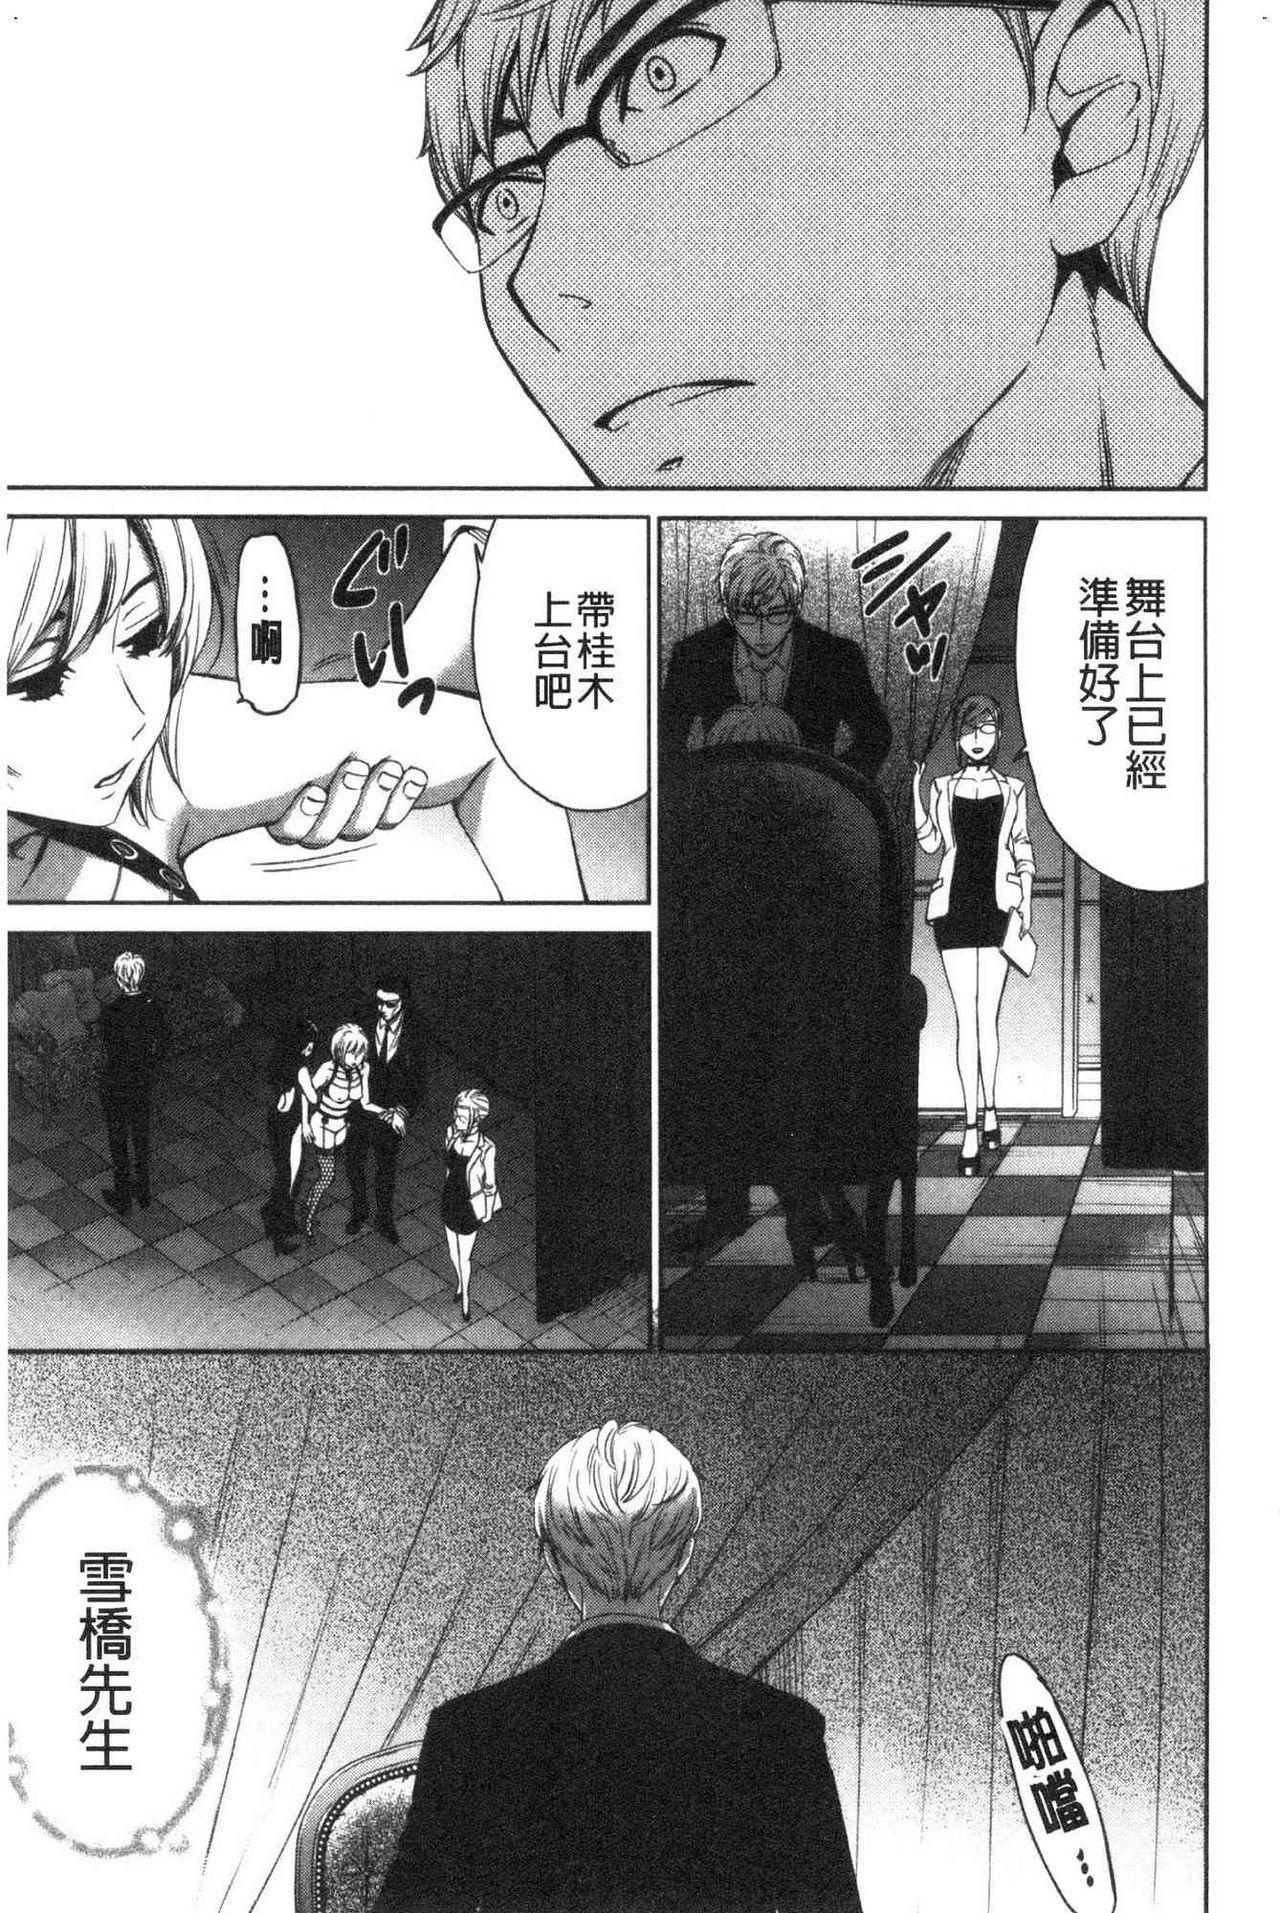 [Gotoh Akira]  21-ji no Onna ~Camera no Mae no Mesuinu~ 2 | 21時之女 ~鏡頭前的牝犬~ 2 [Chinese] 194